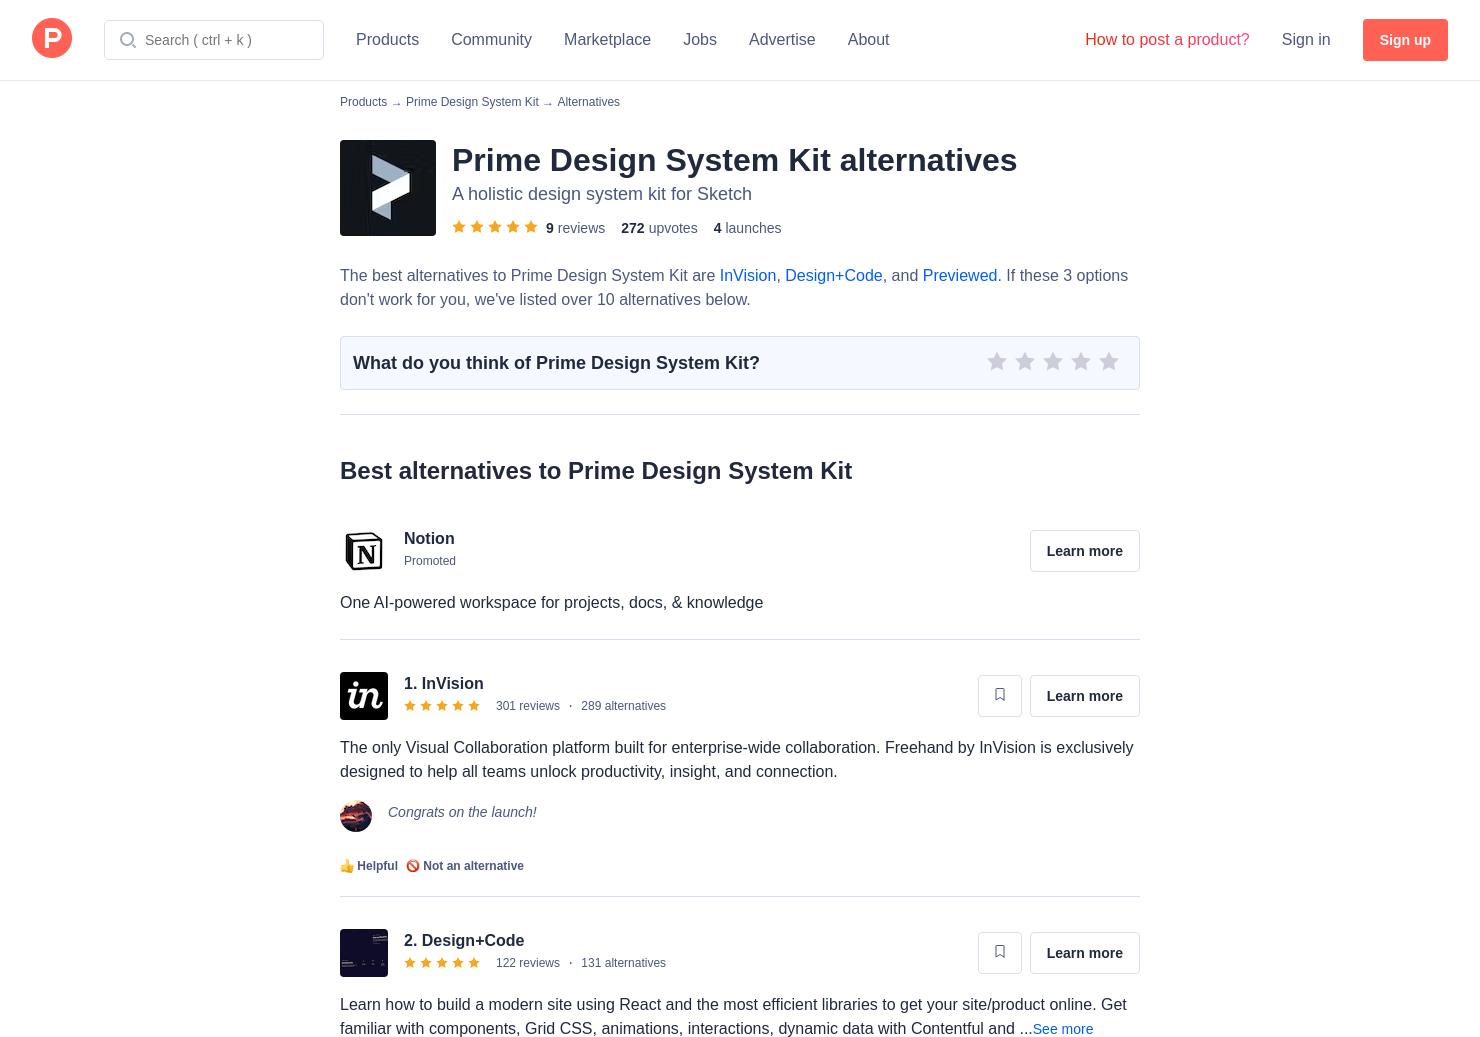 8 Alternatives to Prime Design System Kit | Product Hunt